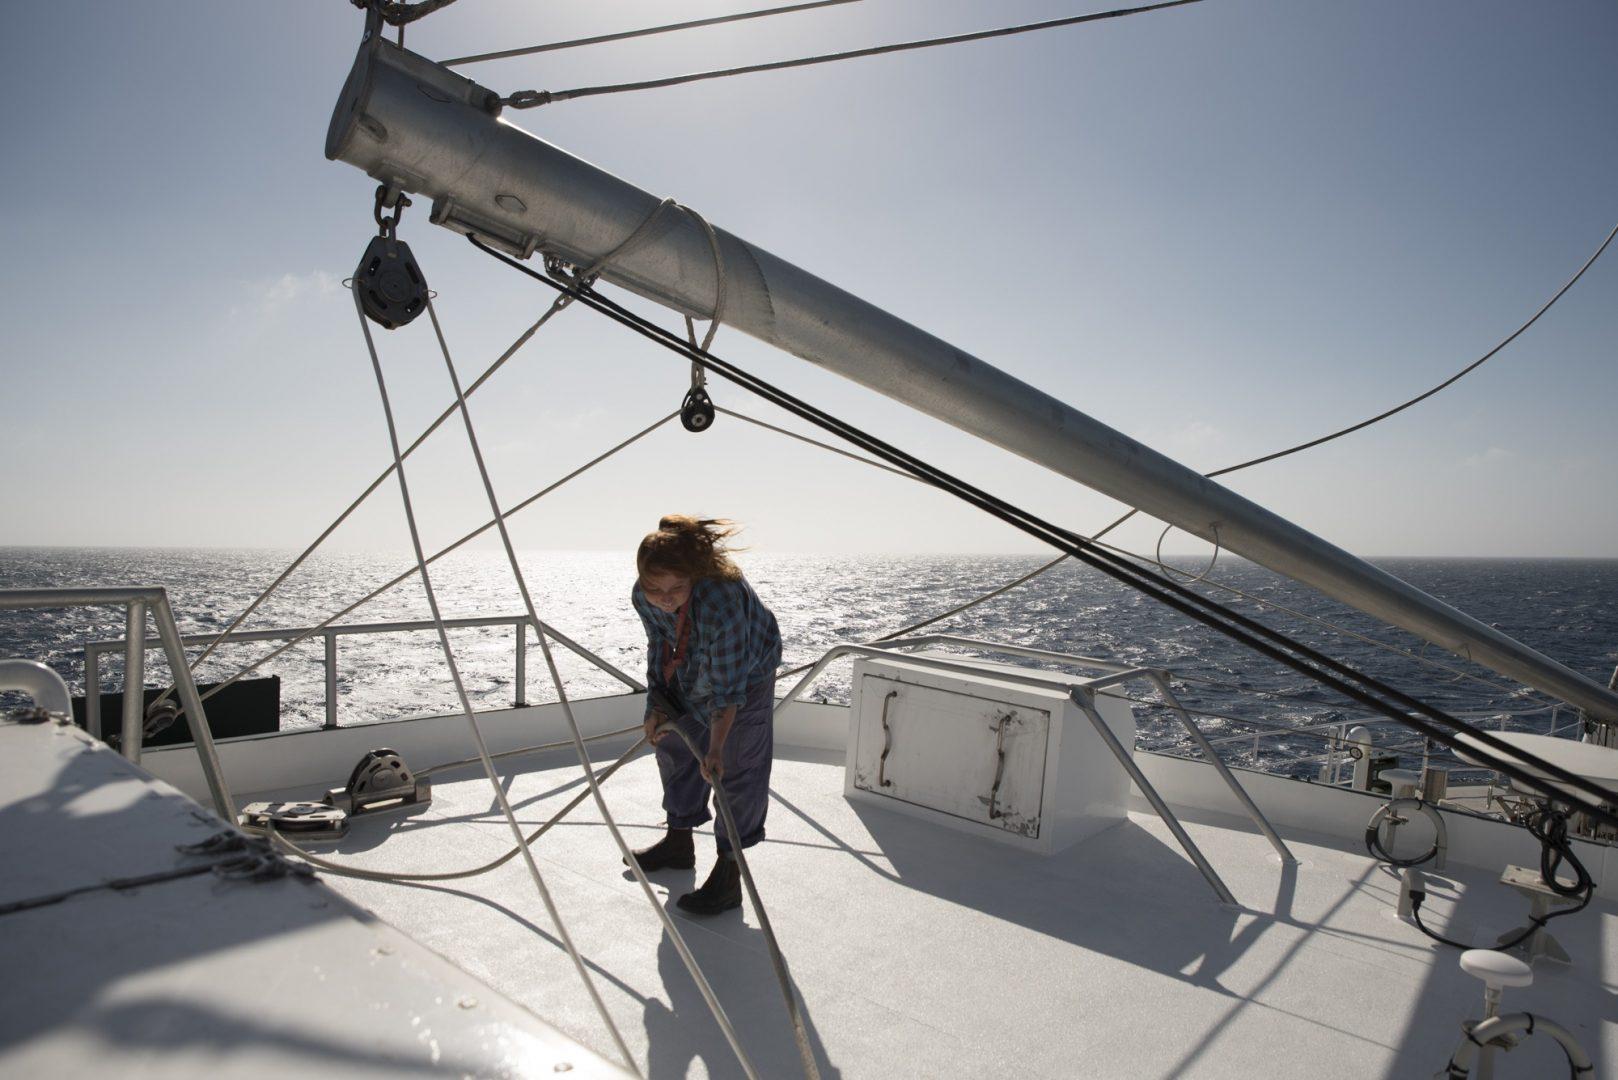 Volunteer dechkand Luca Lamont works the sails on board the Rainbow Warrior III, The Great Australian Bight.